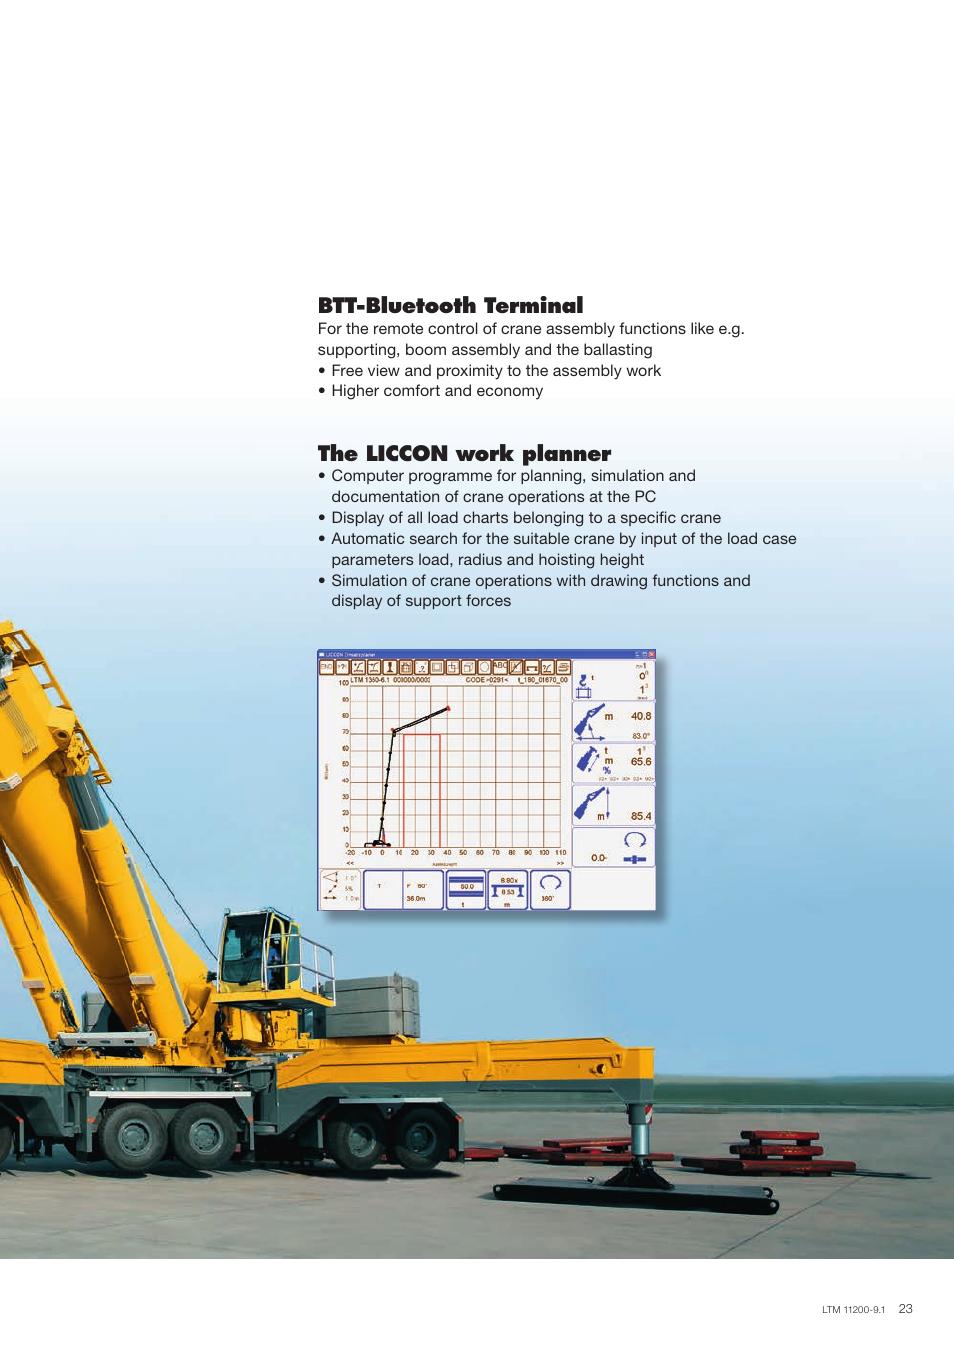 btt bluetooth terminal the liccon work planner liebherr ltm 11200 rh manualsdir com Ticket Support Manual Vizio Support Manual